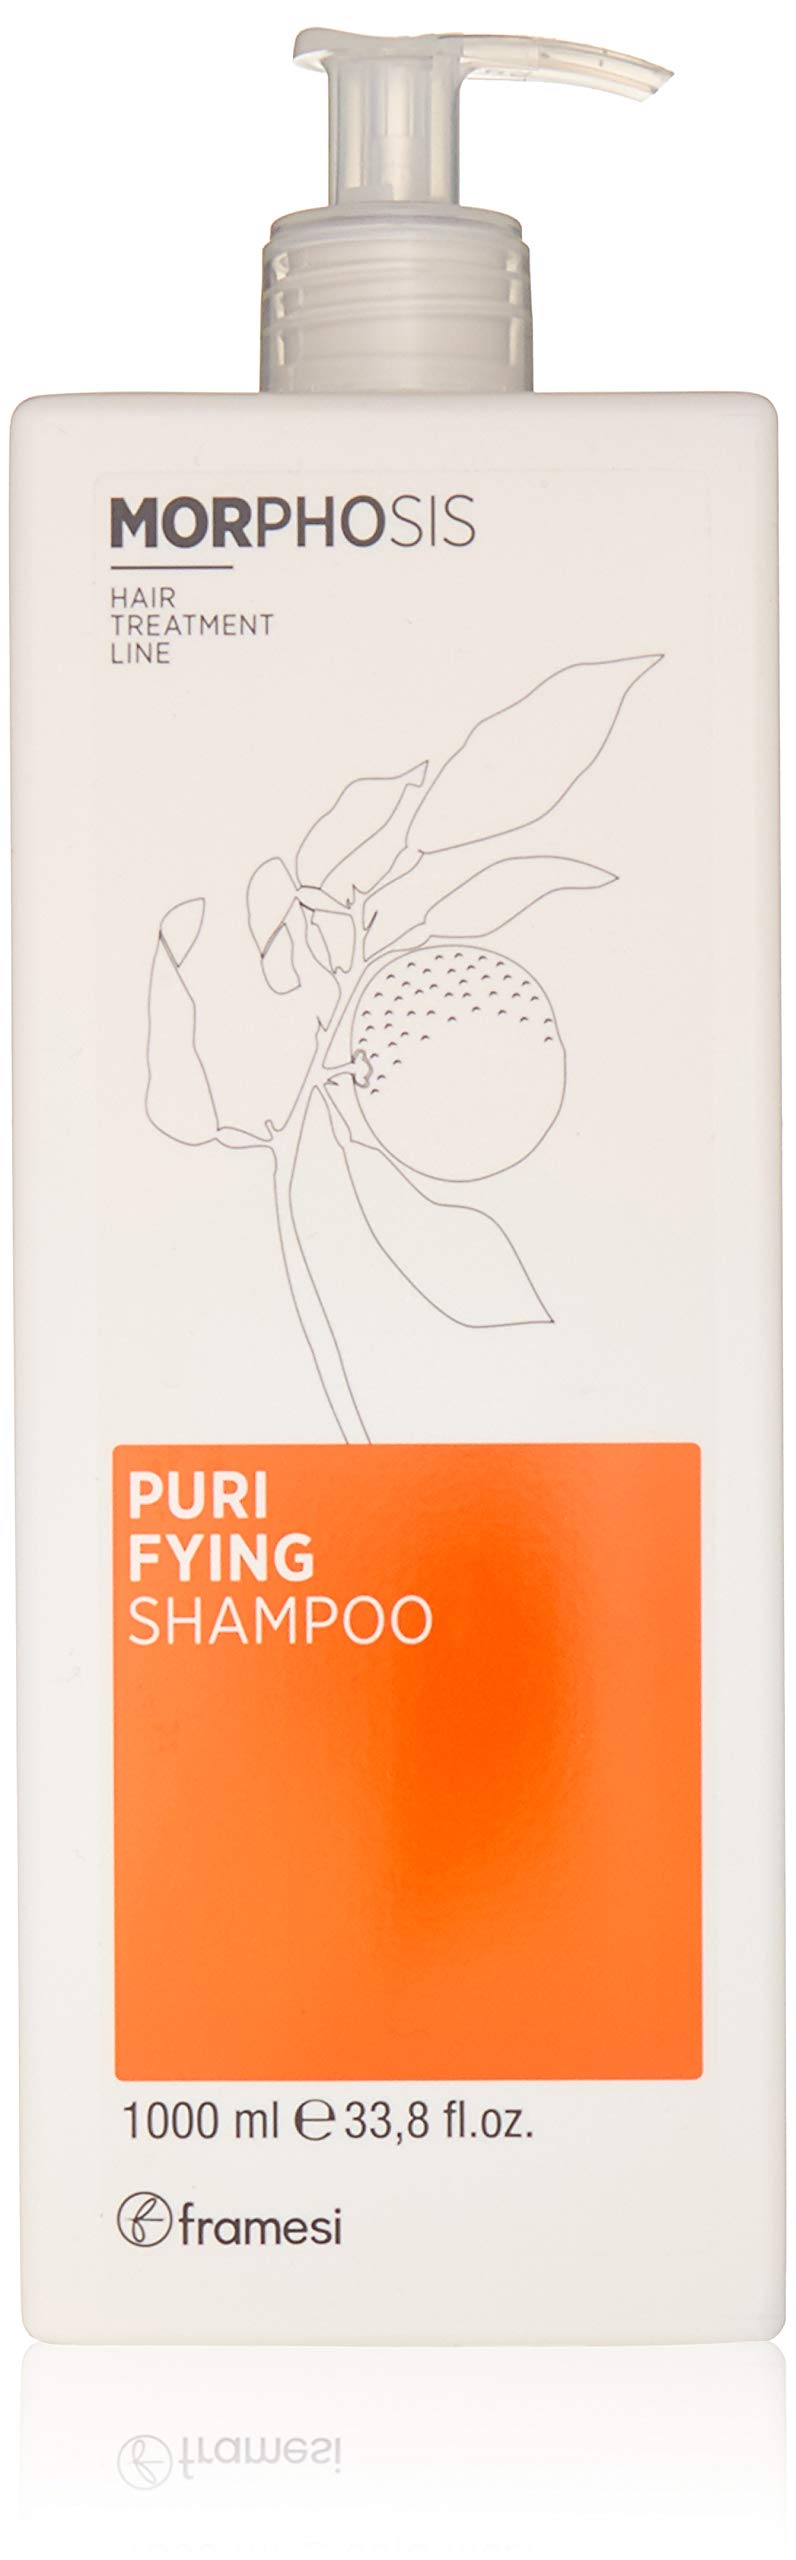 Framesi Morphosis Purifying Shampoo - 33.8 Ounce - Scalp Treatment, Color Safe and Anti Dandruff Shampoo, Vegan, Gluten Free, Cruelty Free by framesi